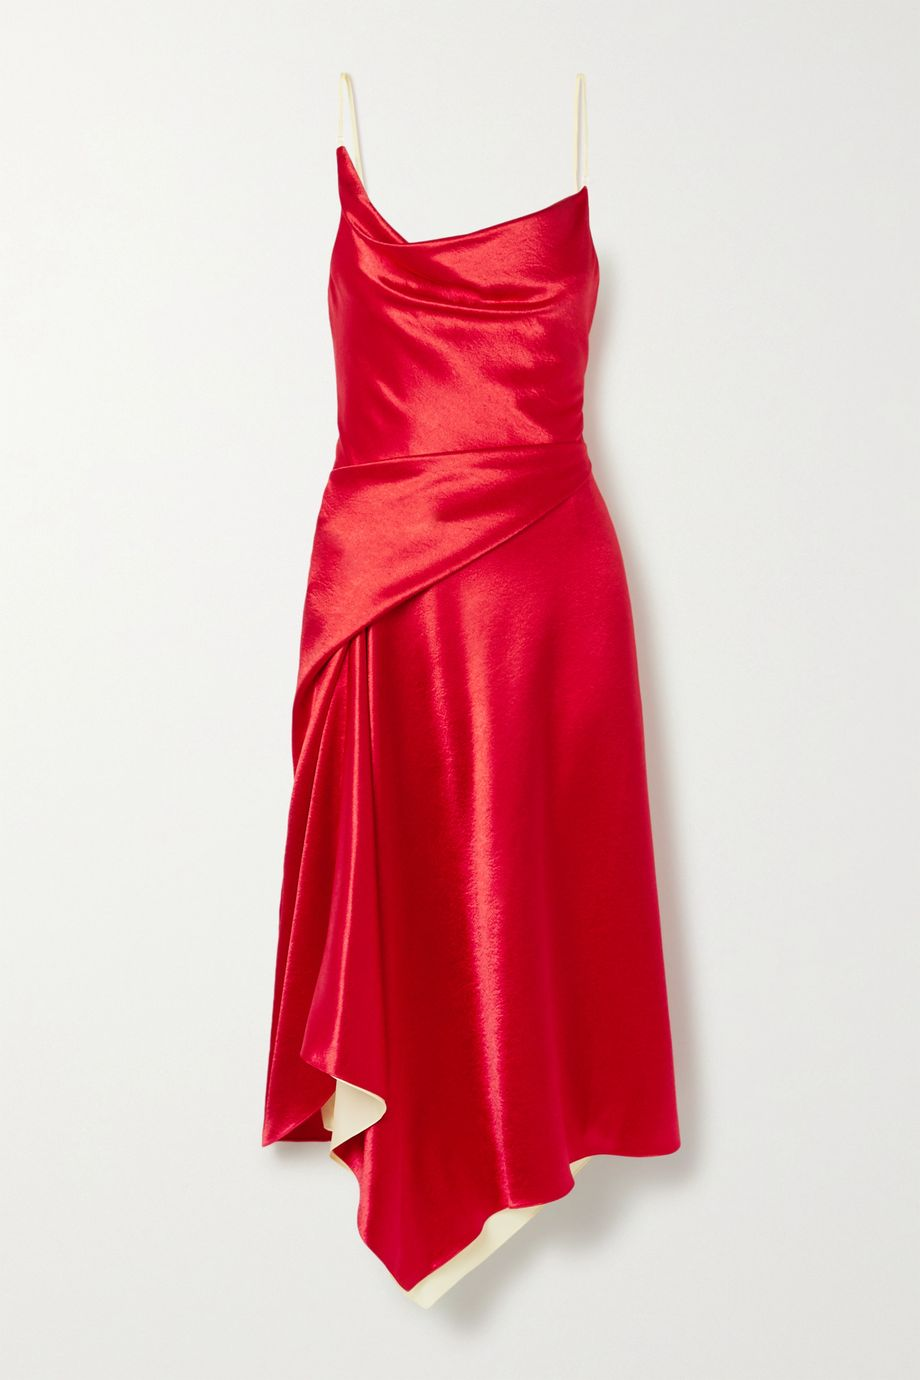 Sies Marjan Farrah asymmetric two-tone draped hammered-satin dress